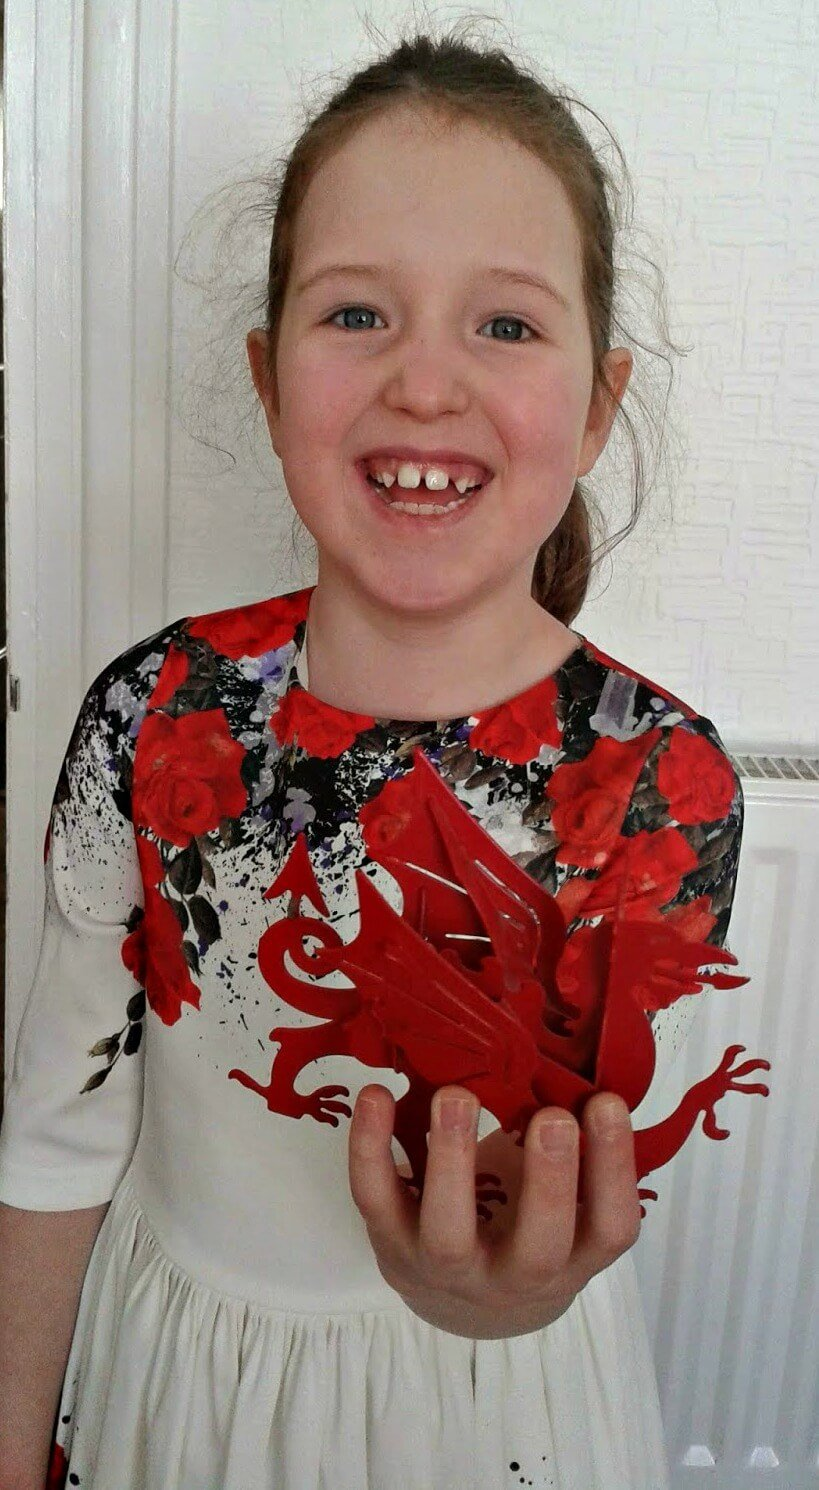 poem for St. David's Day - Caitlin holds her bard's dragon trophy aloft